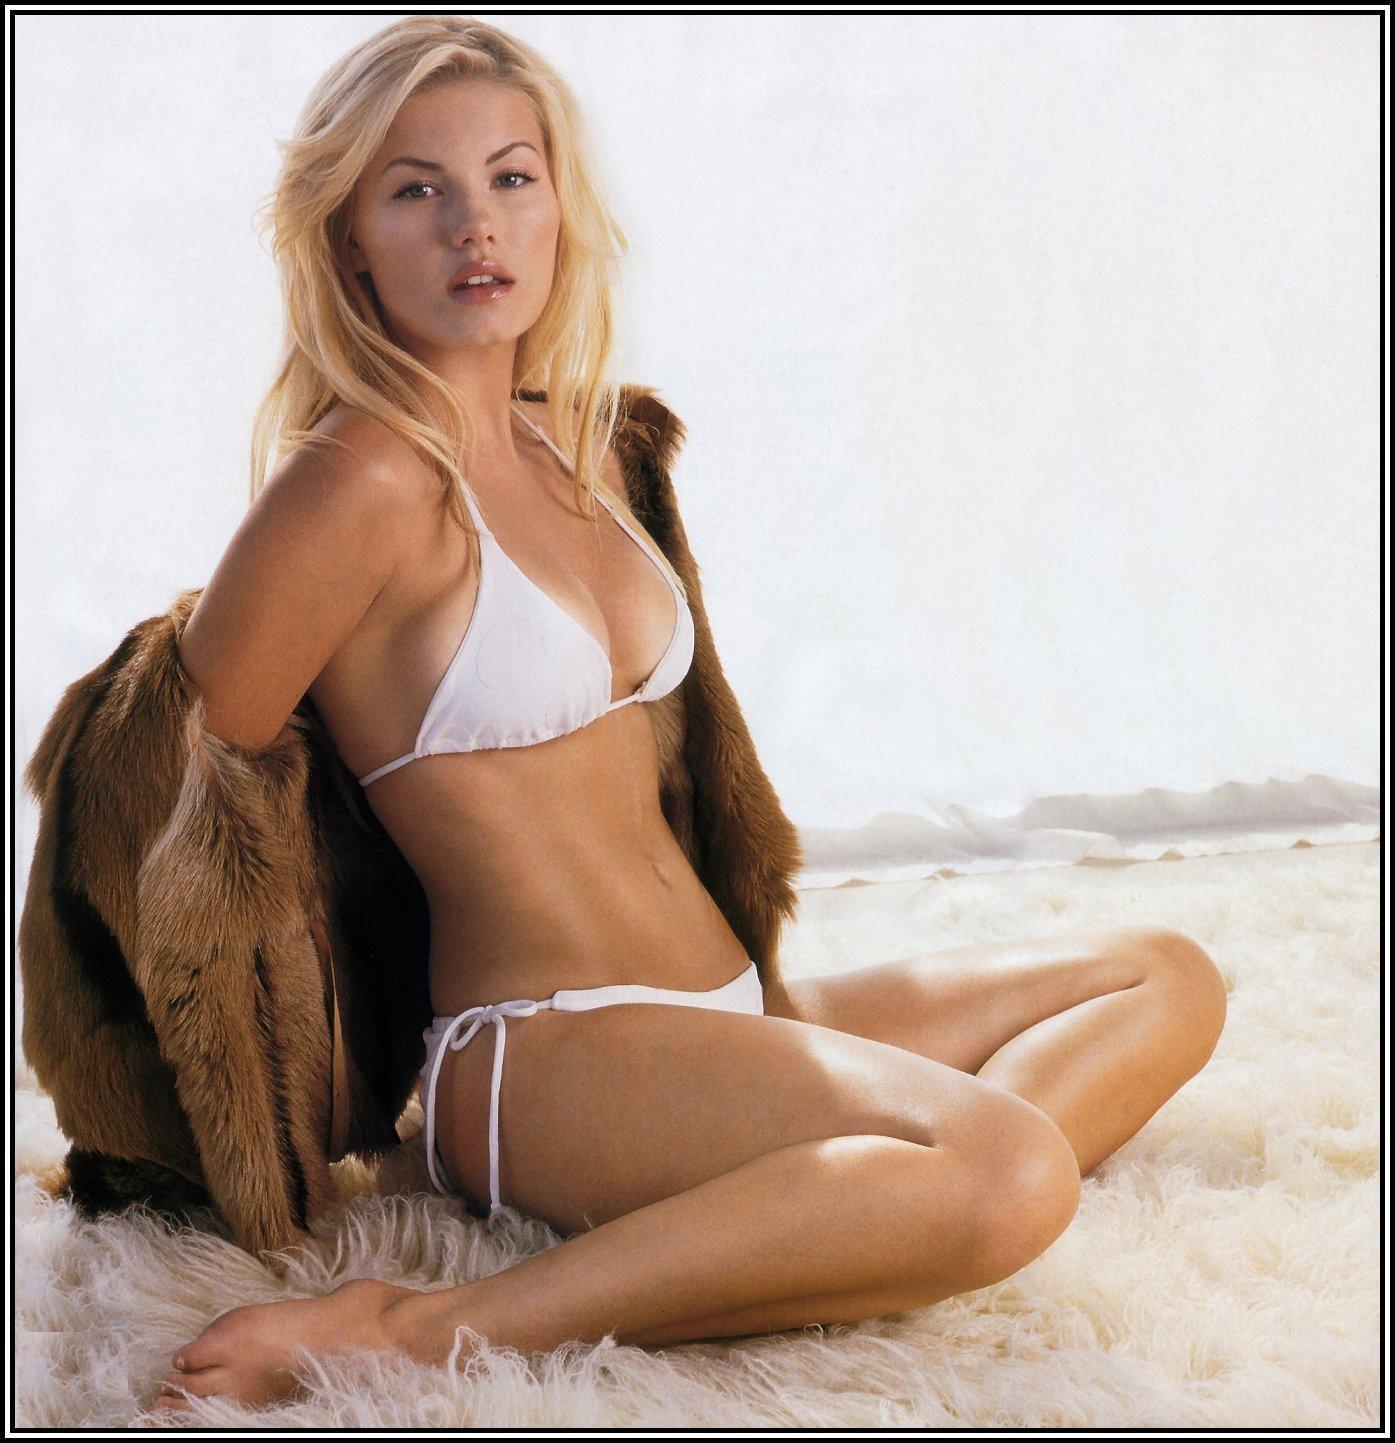 Elisha Cuthbert sexy bikini pic (2)